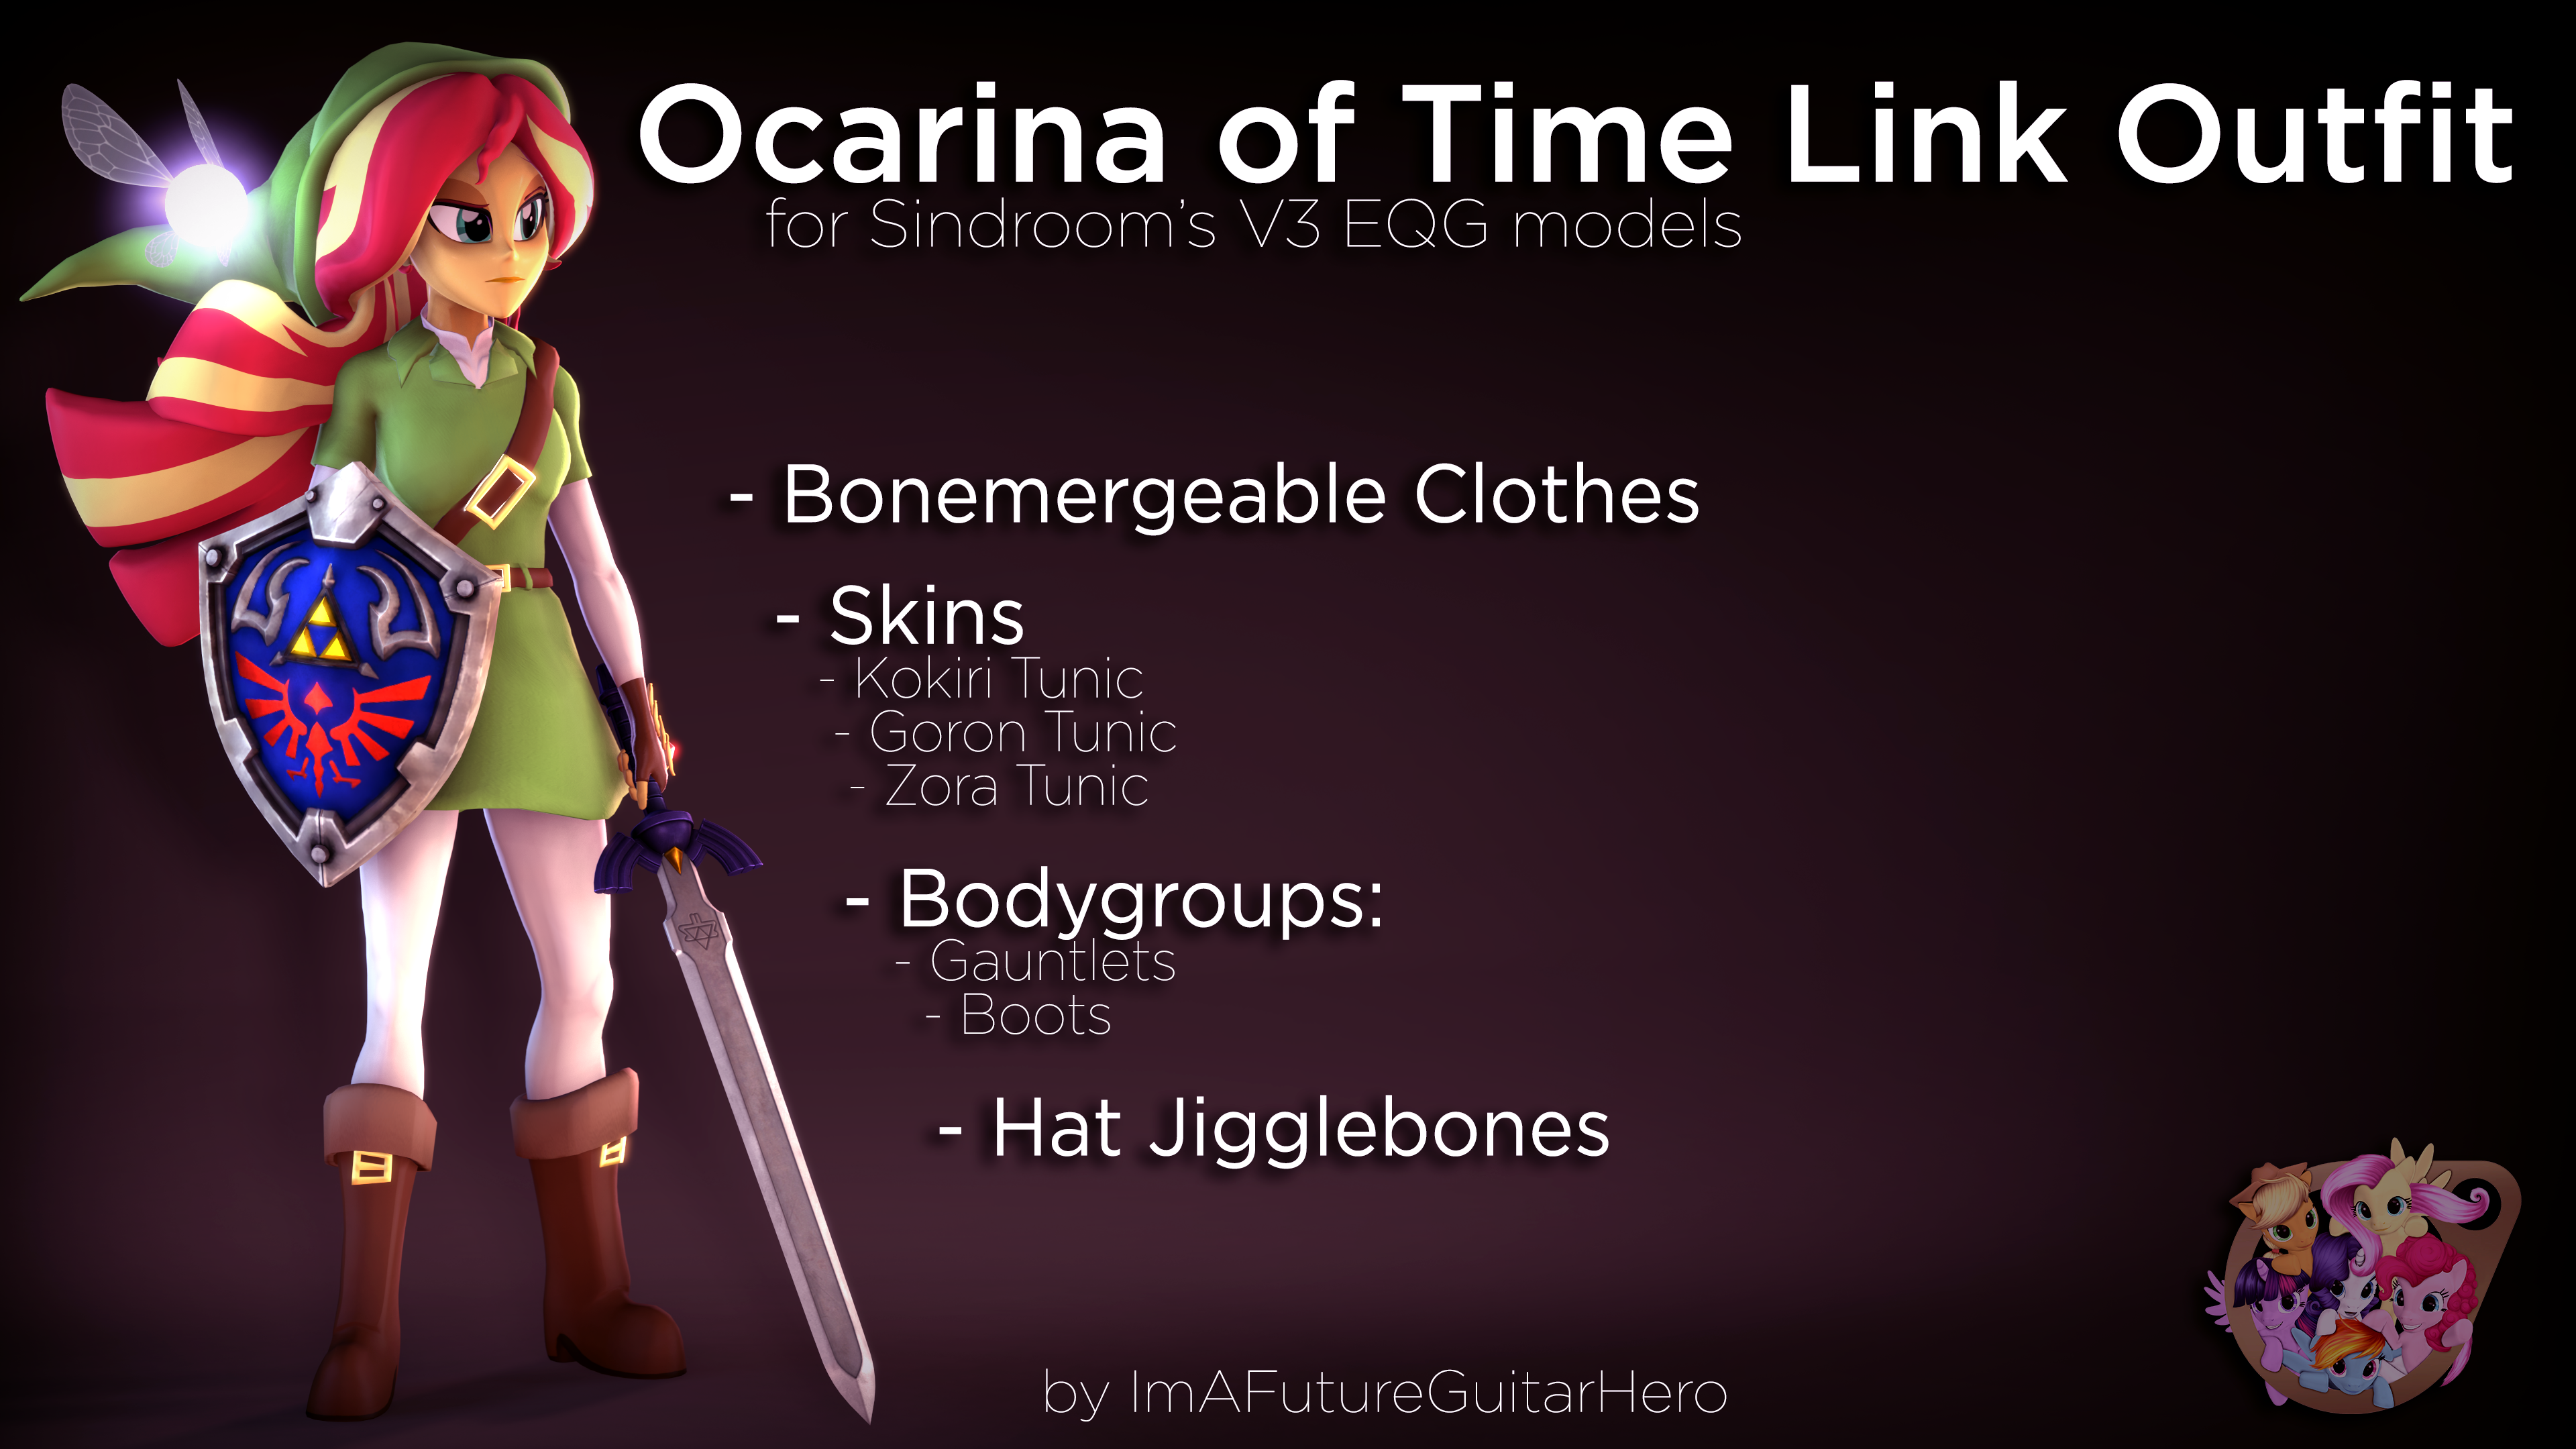 [SFM] [MLP] [DL] Link Outfit for V3 EQG by ImAFutureGuitarHero